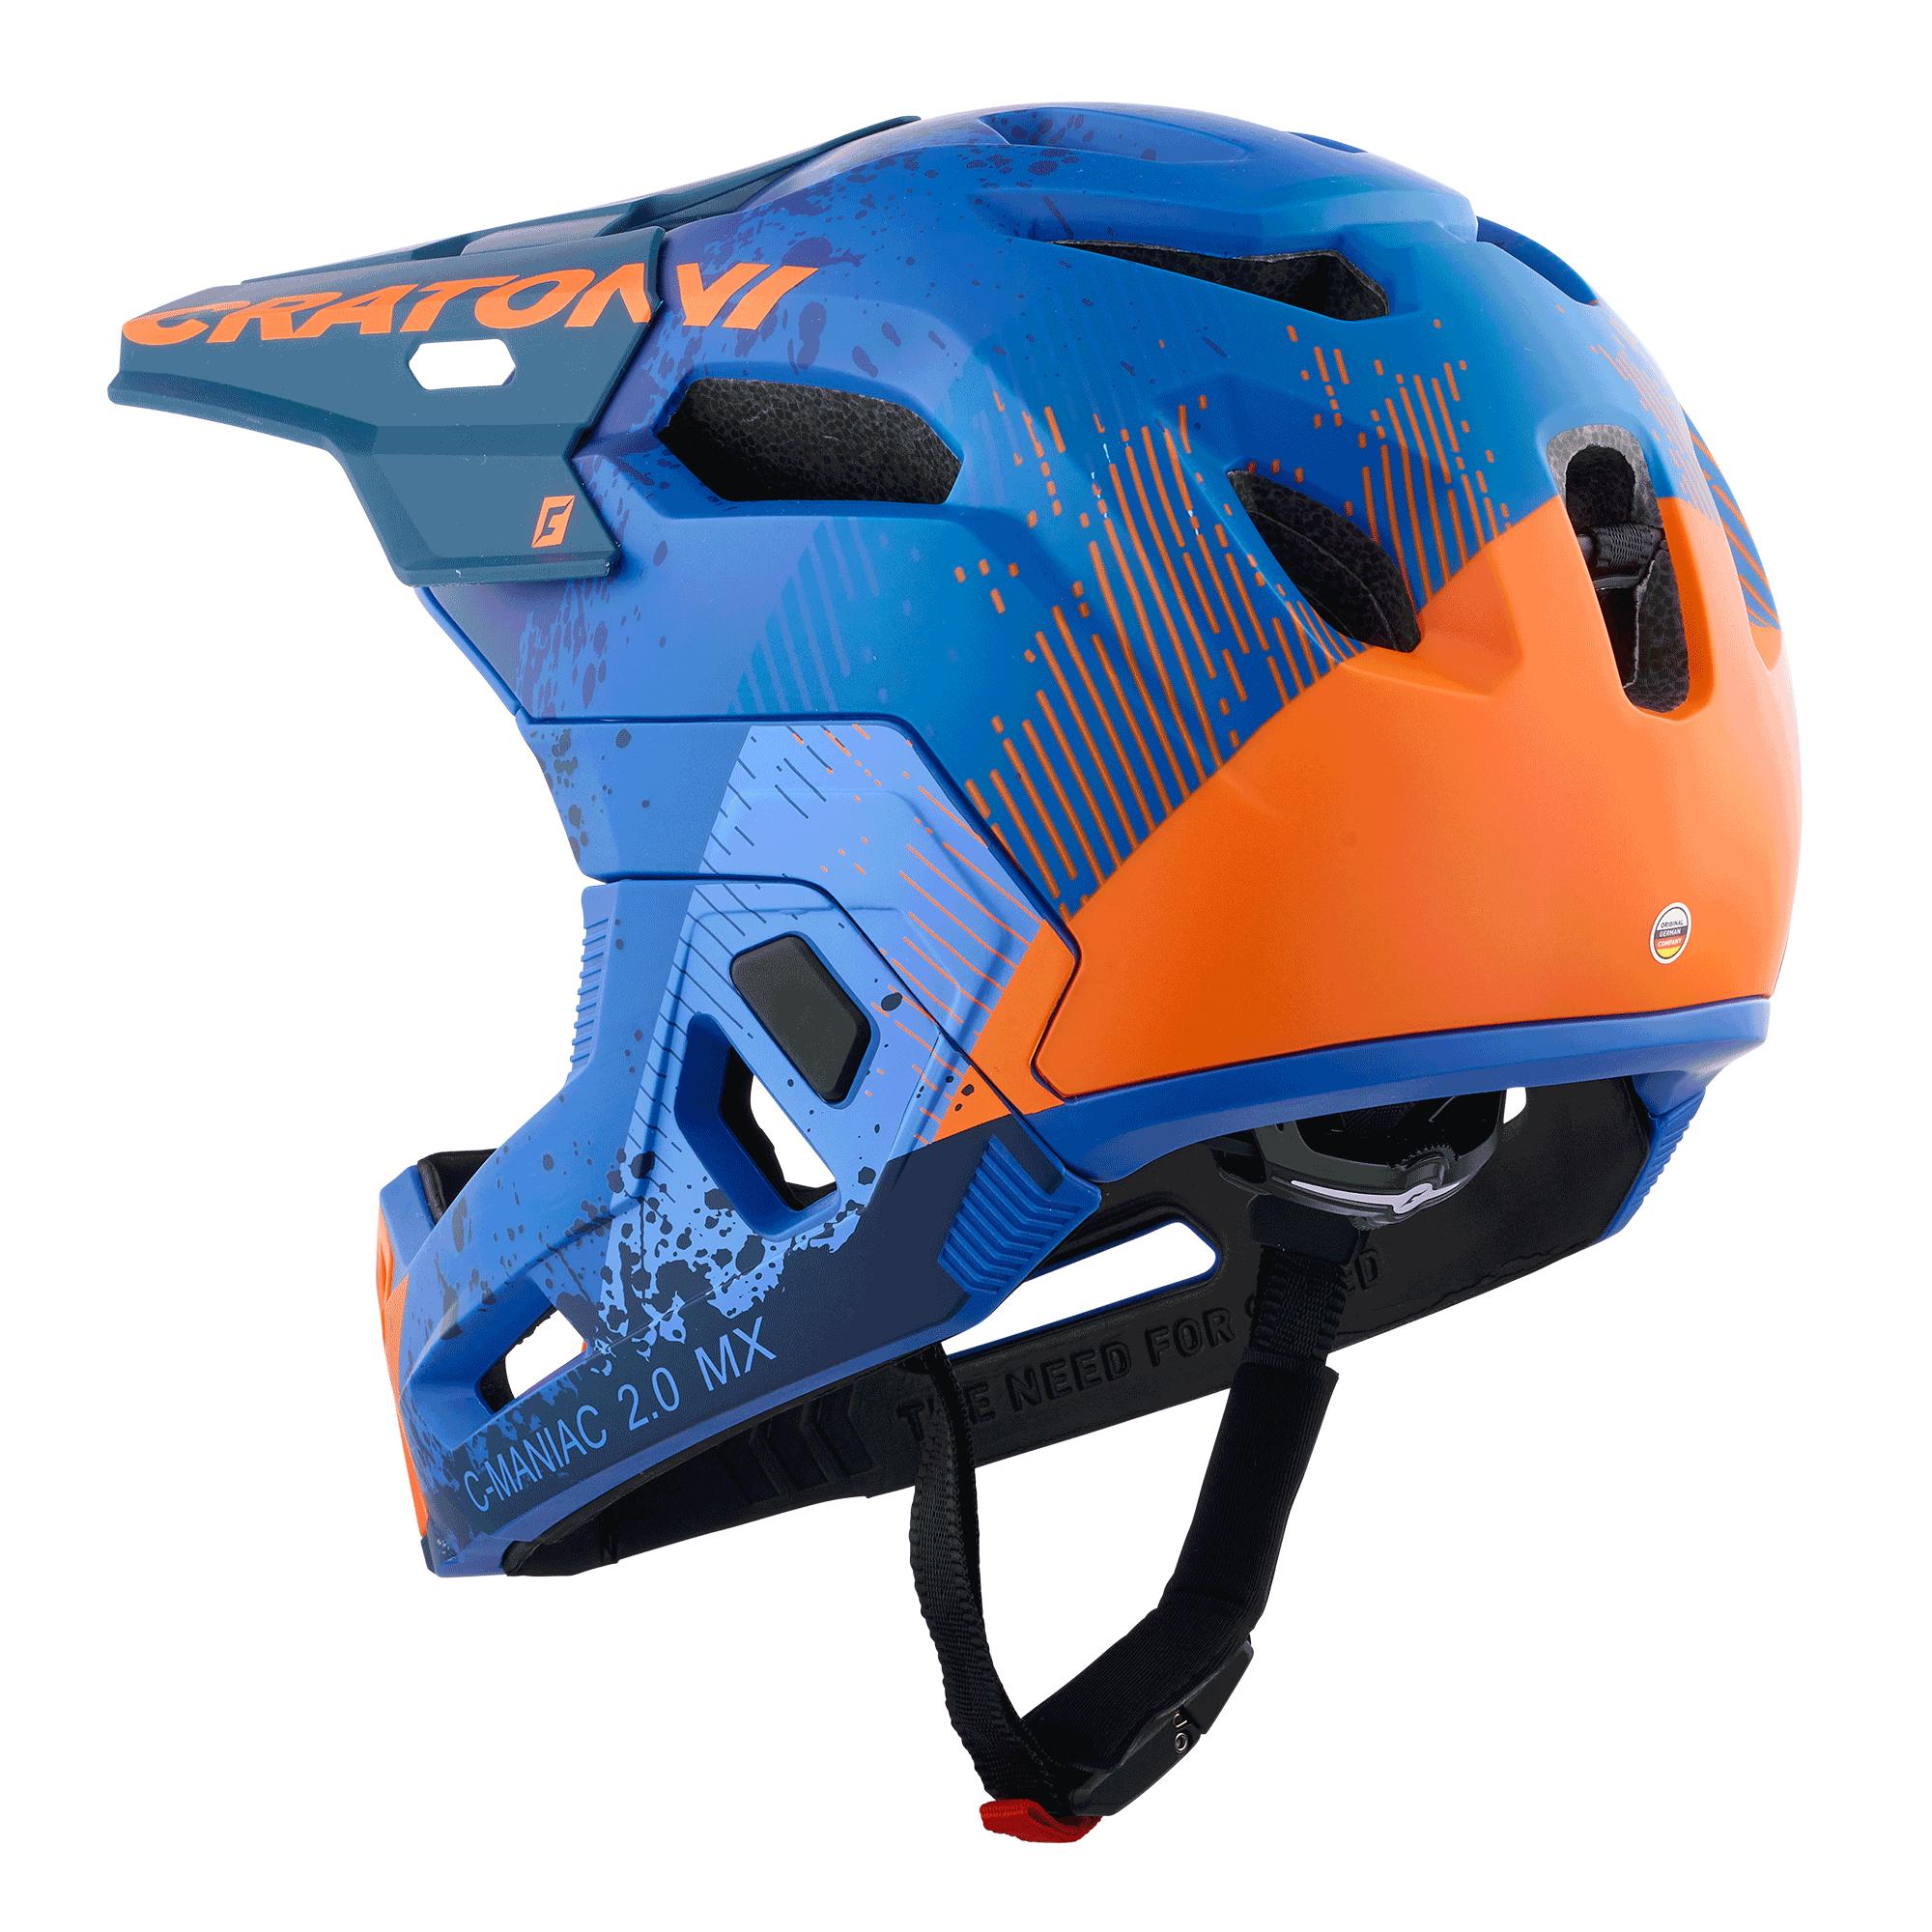 C-Maniac 2.0 MX blue-orange matt